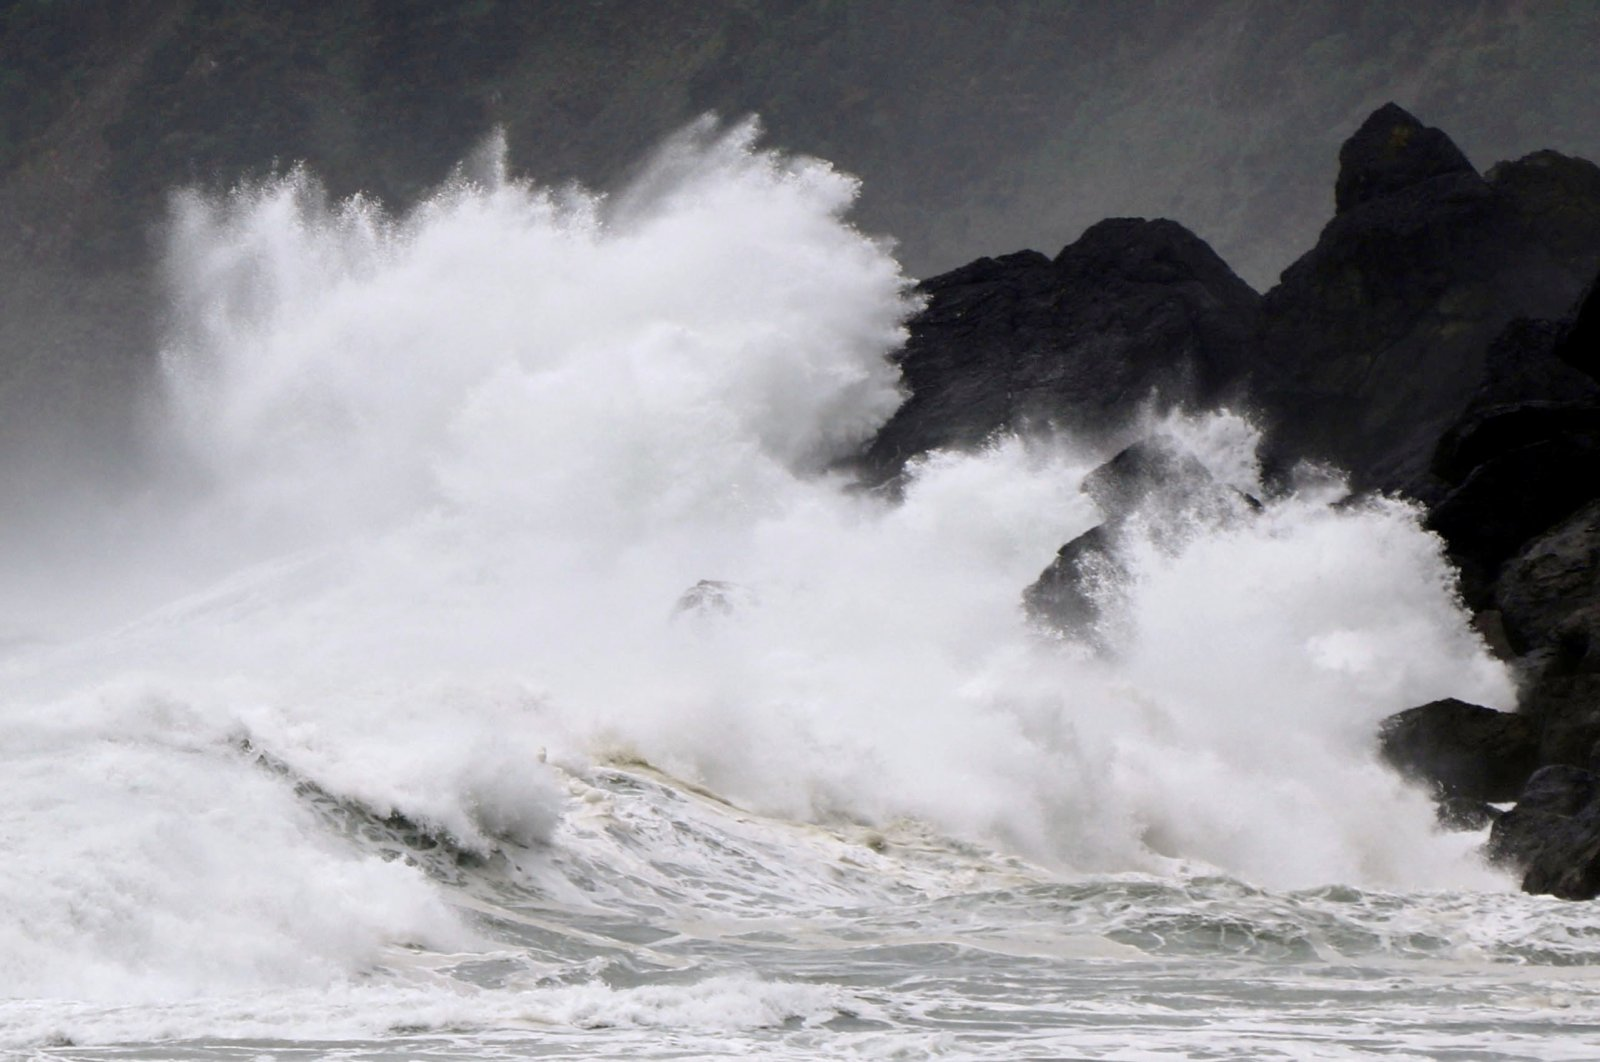 High waves triggered by Typhoon Haishen crash against the coast of Amami Oshima island, Kagoshima prefecture, Japan Sept. 5, 2020. (Kyodo via Reuters)